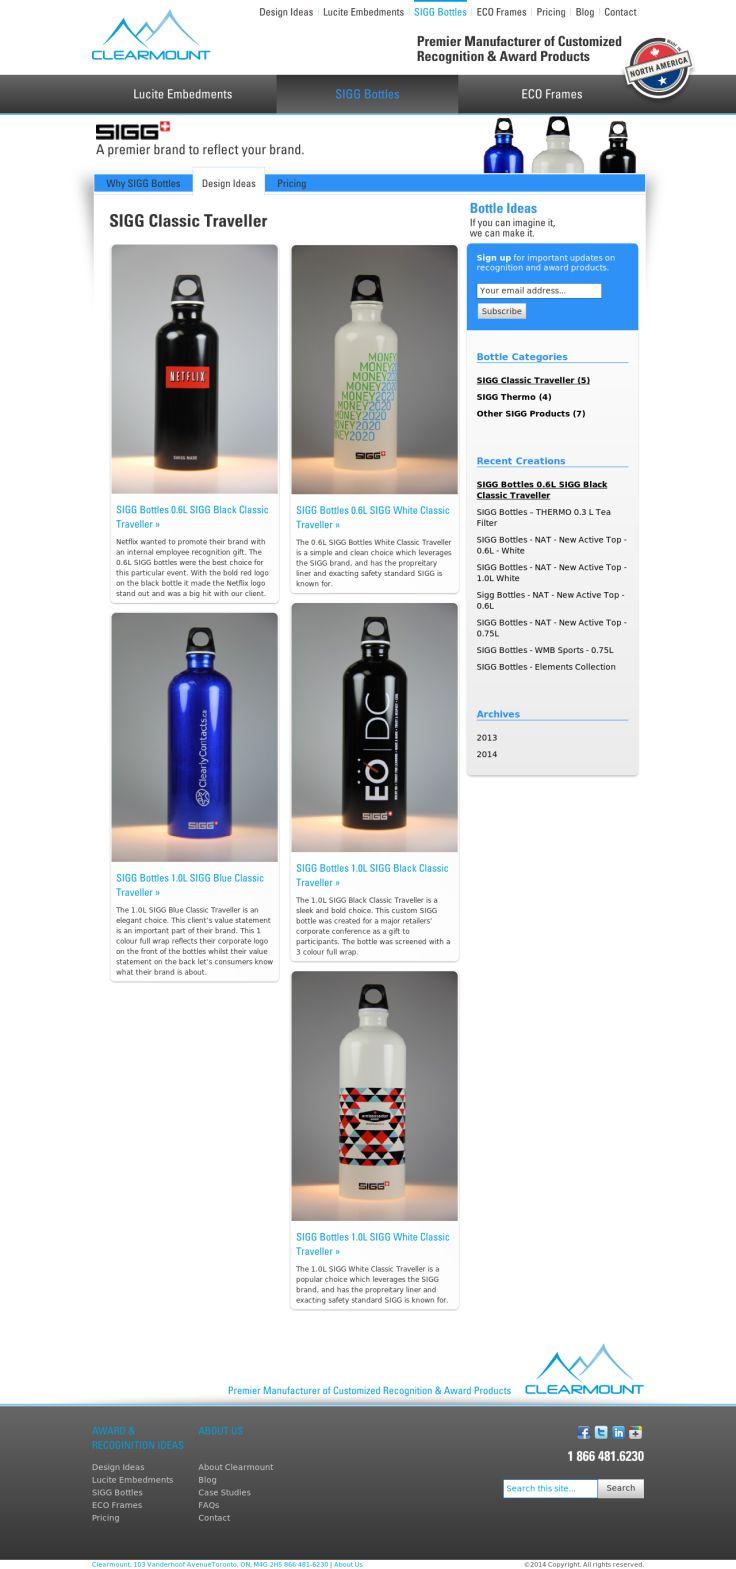 Clearmount- http://www.creatchmanpromo.ca/